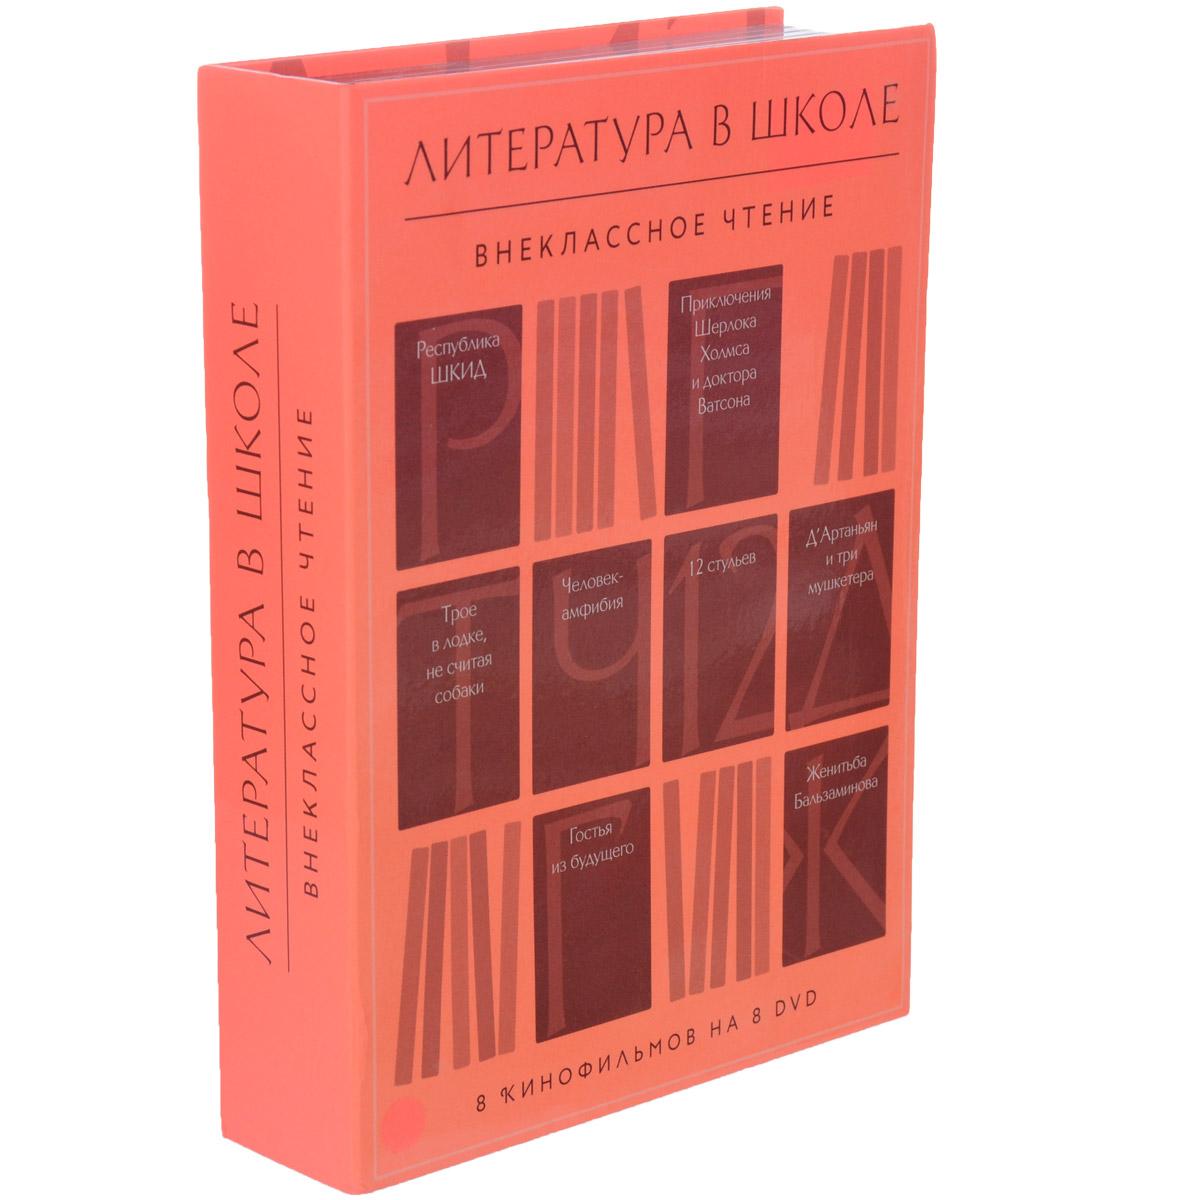 Литература в школе. Внеклассное чтение (8 DVD) видеодиски нд плэй защитники 2016 dvd video dvd box